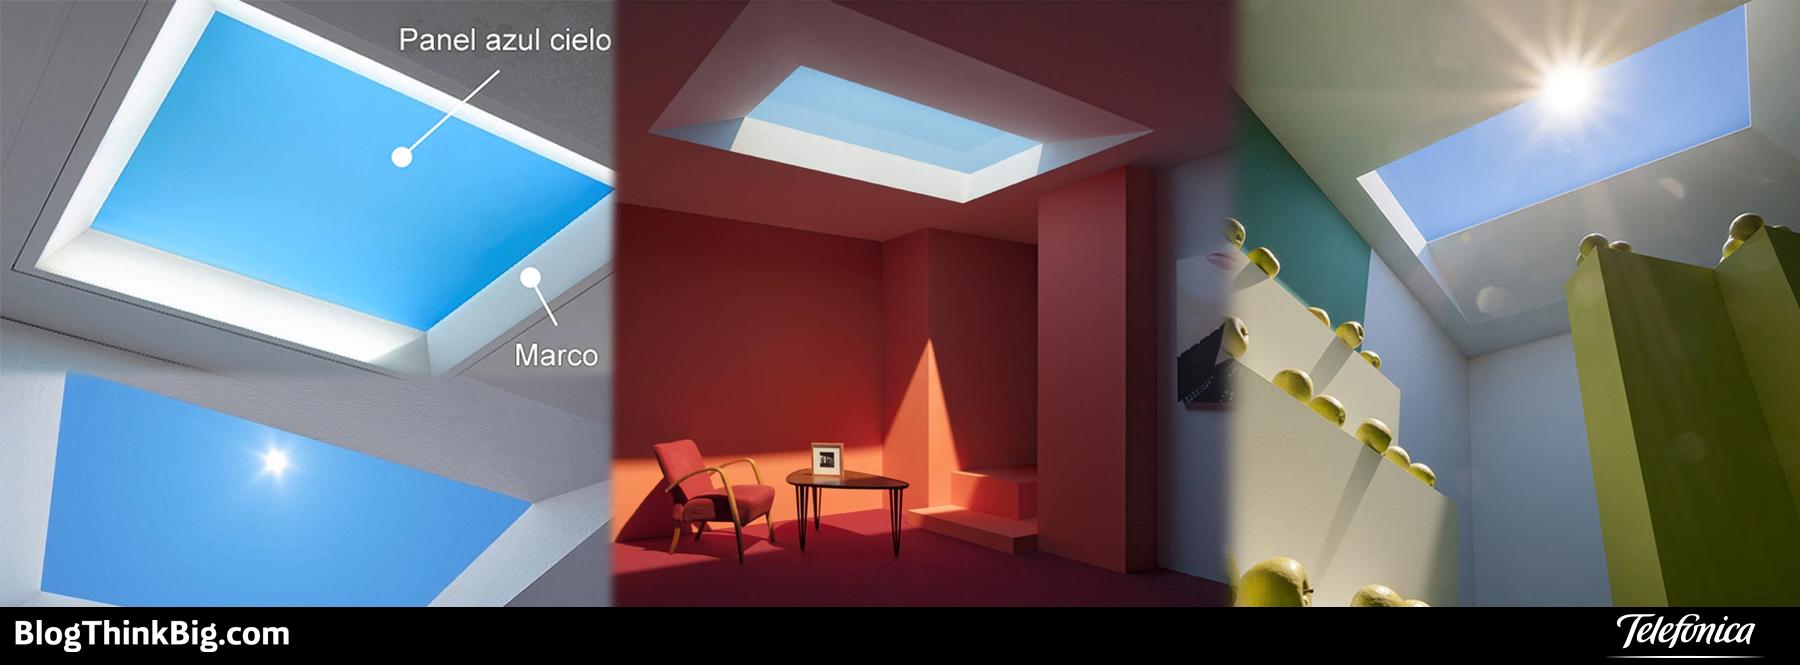 Tragaluces LED que simulan la luz del sol para oficinas